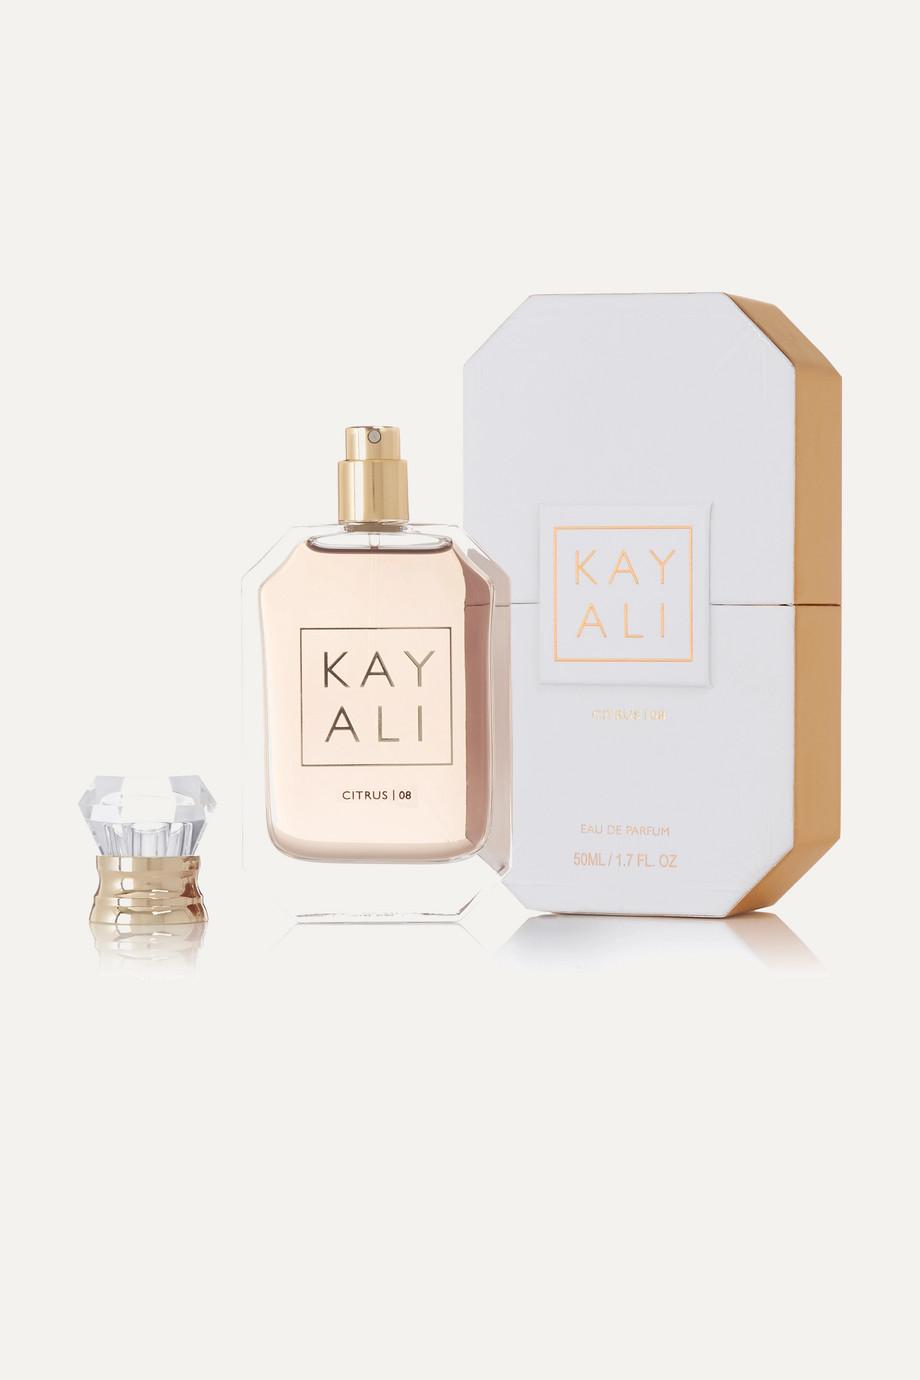 Huda Beauty Eau de Parfum - Kayali Citrus 08, 50ml